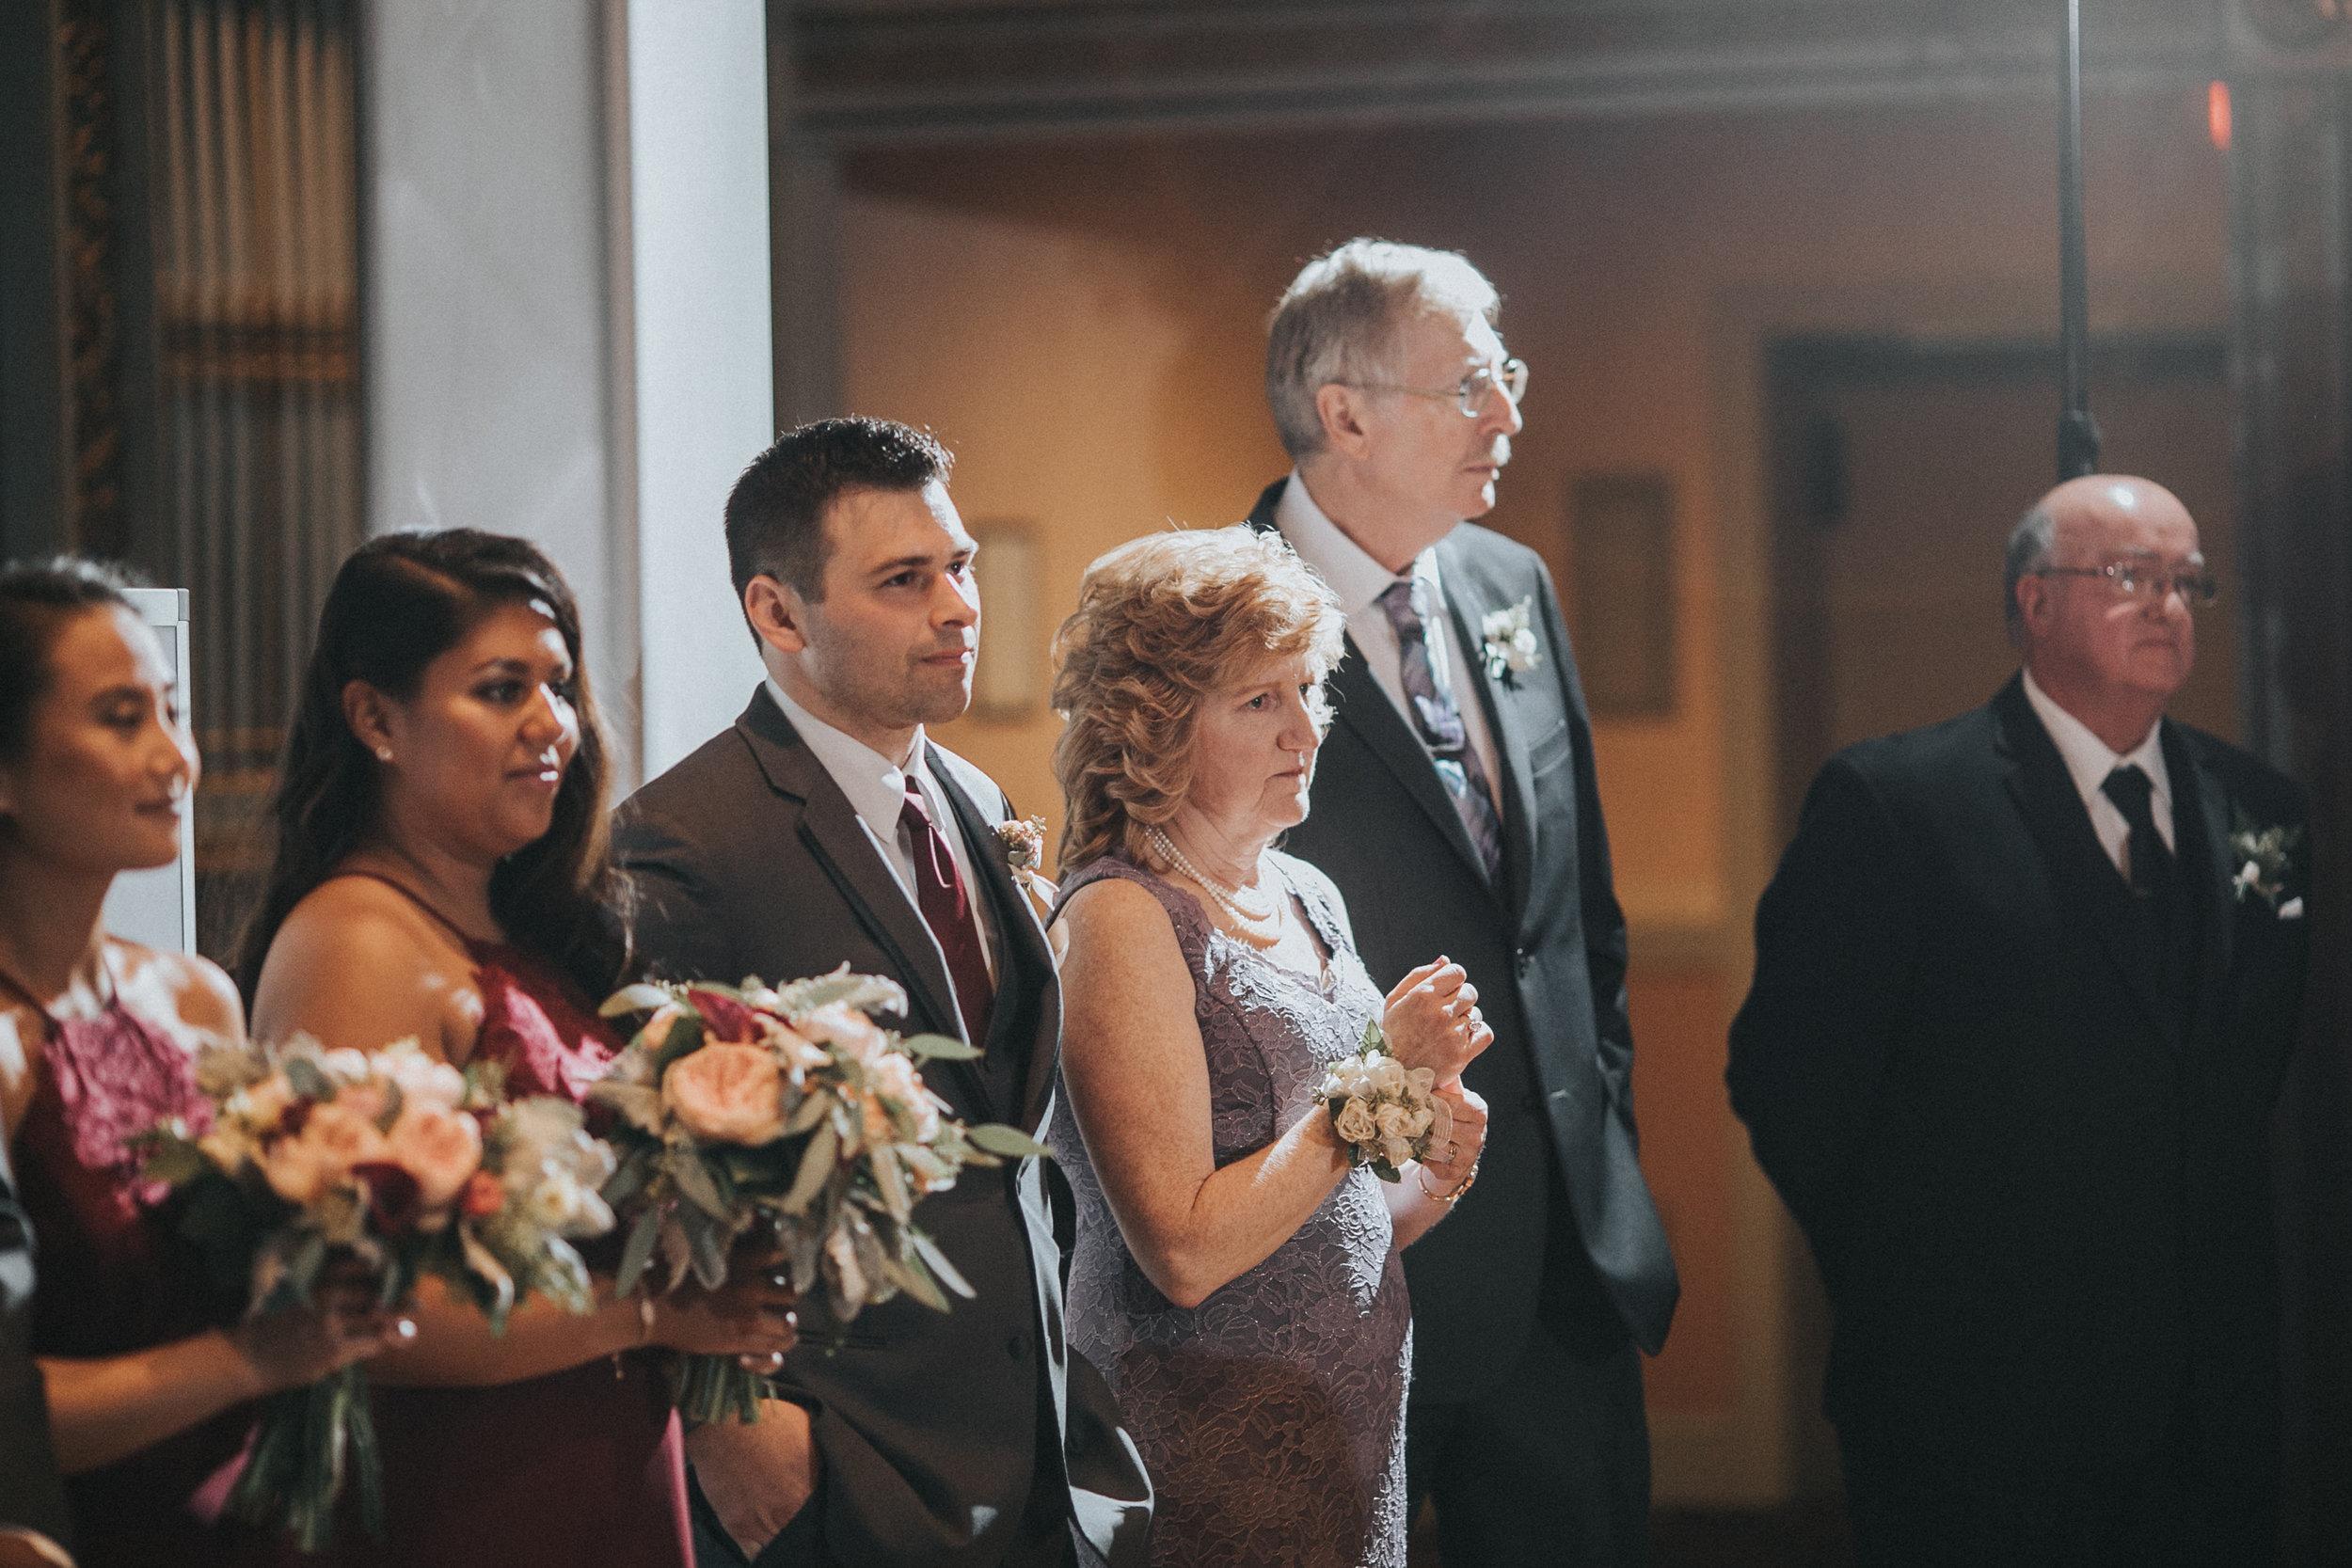 New-Jersey-Wedding-Photography-Fishers-Tudor-House-JennaLynnPhotography-Reception-Kathleen&Eddie-95.jpg